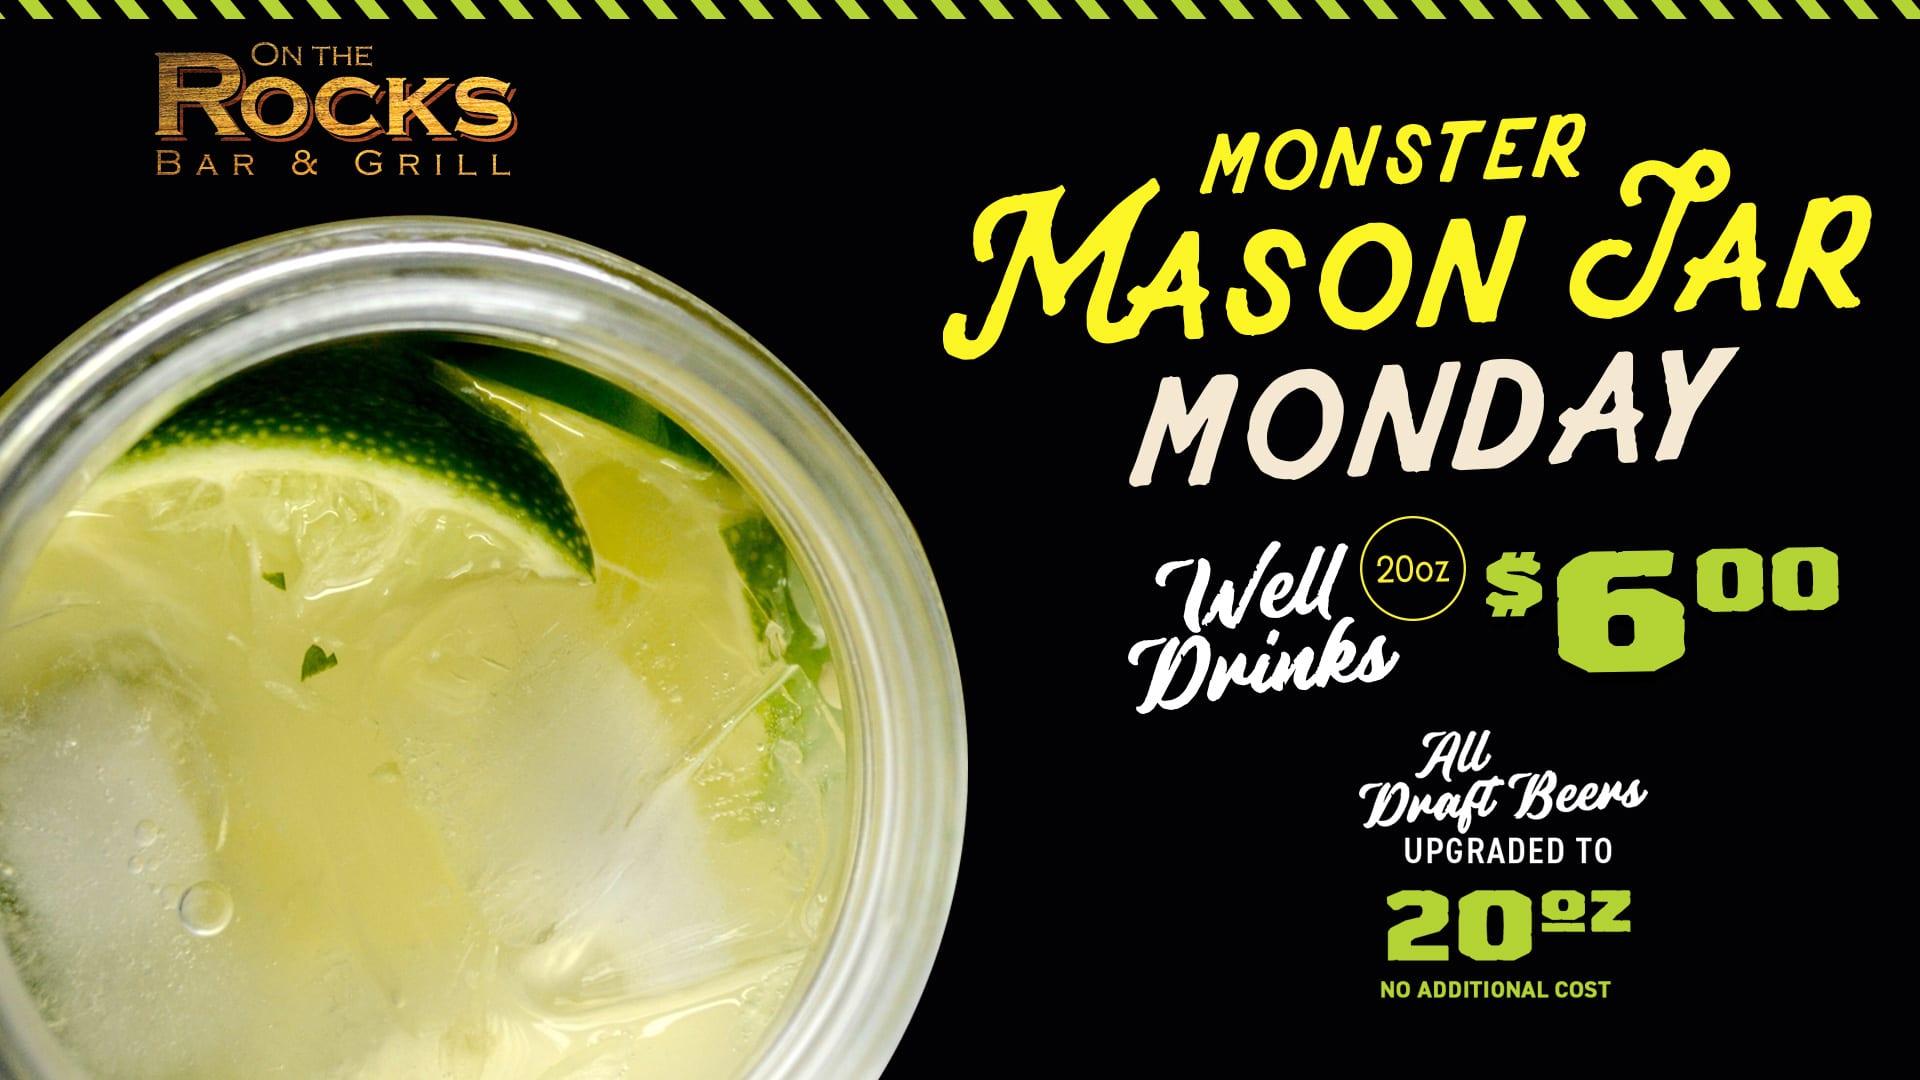 Monster Mason Jar Monday